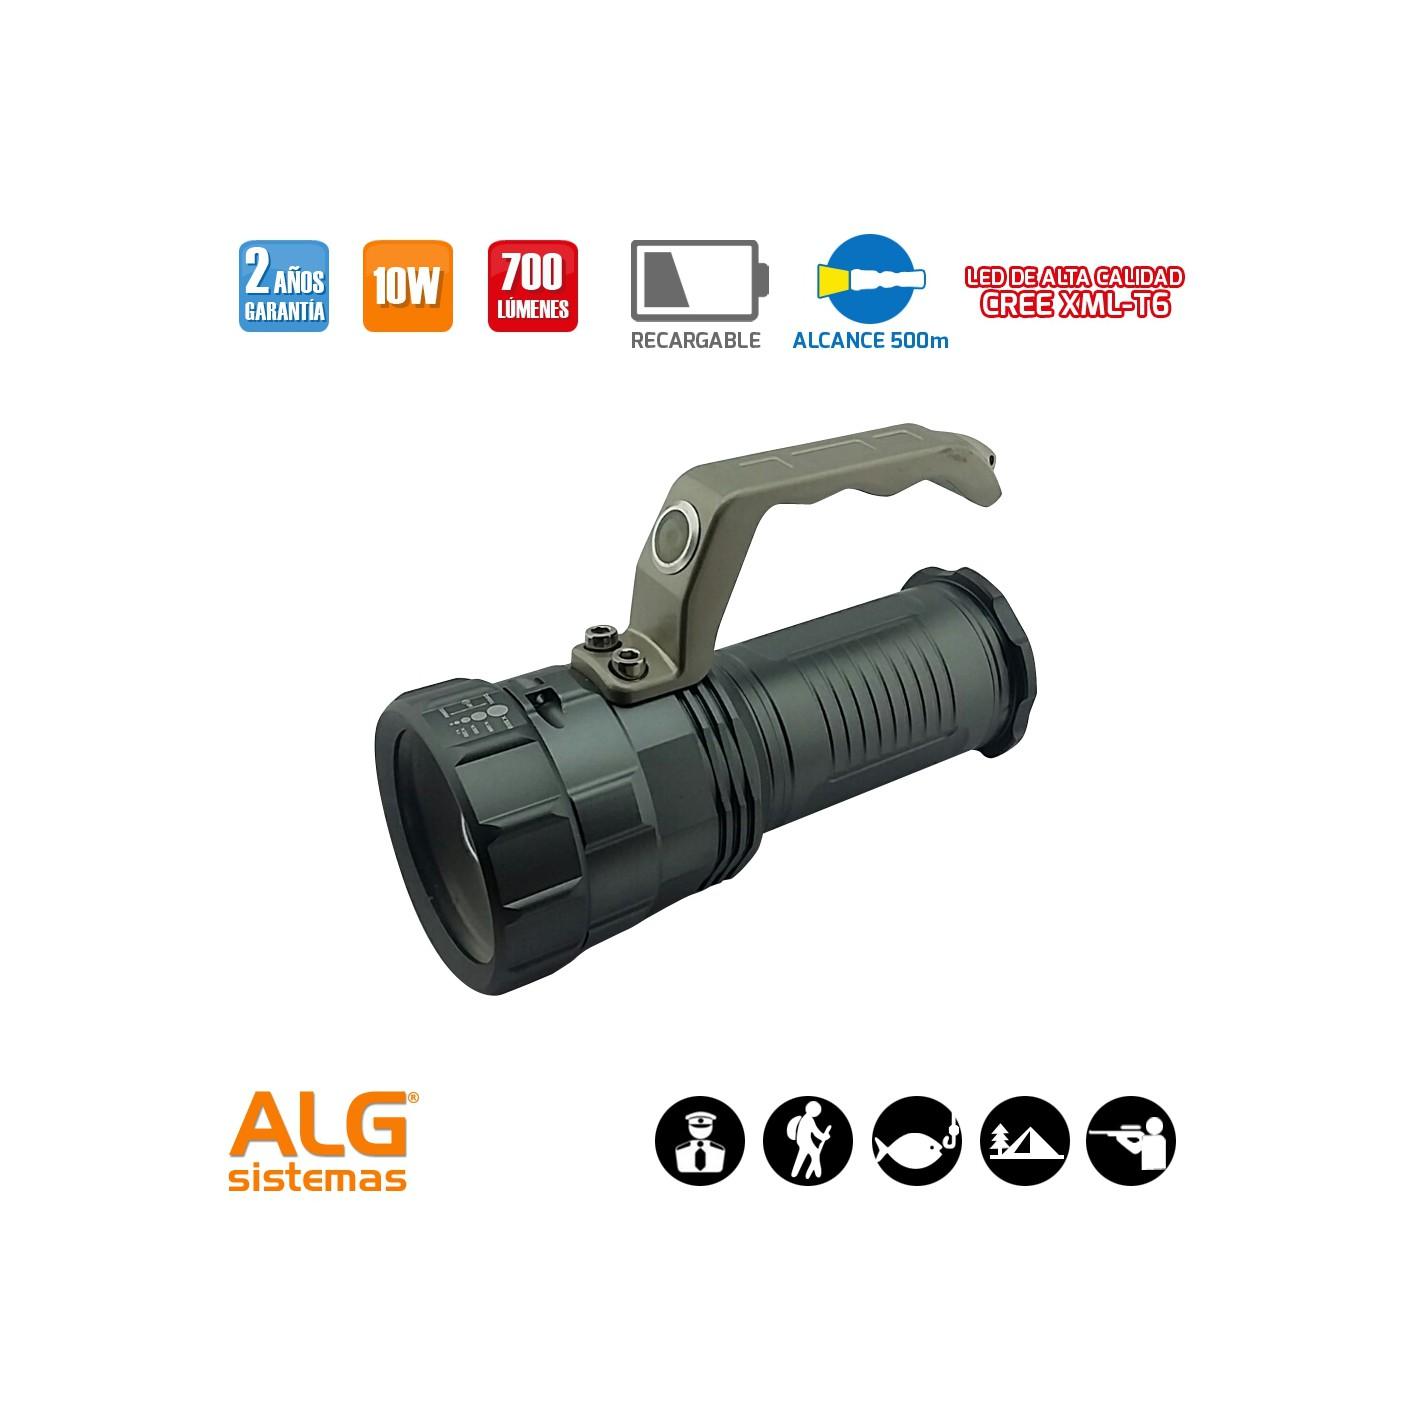 Linterna led recargable 10w con con zoom y asa alg sistemas - Linterna recargable led ...